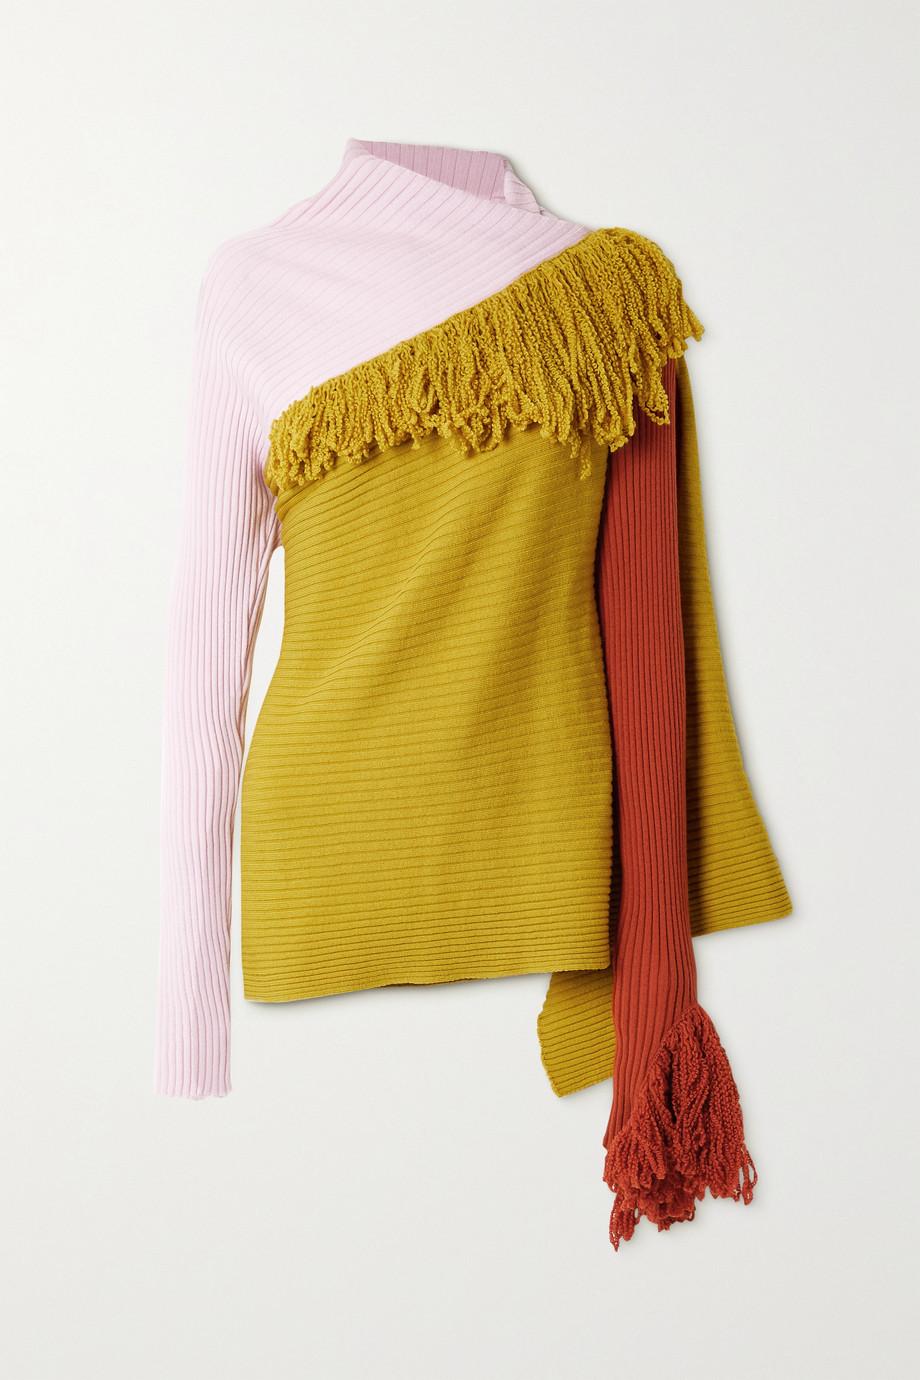 Marques' Almeida ReM'Ade by Marques' Almeida fringed ribbed merino wool sweater